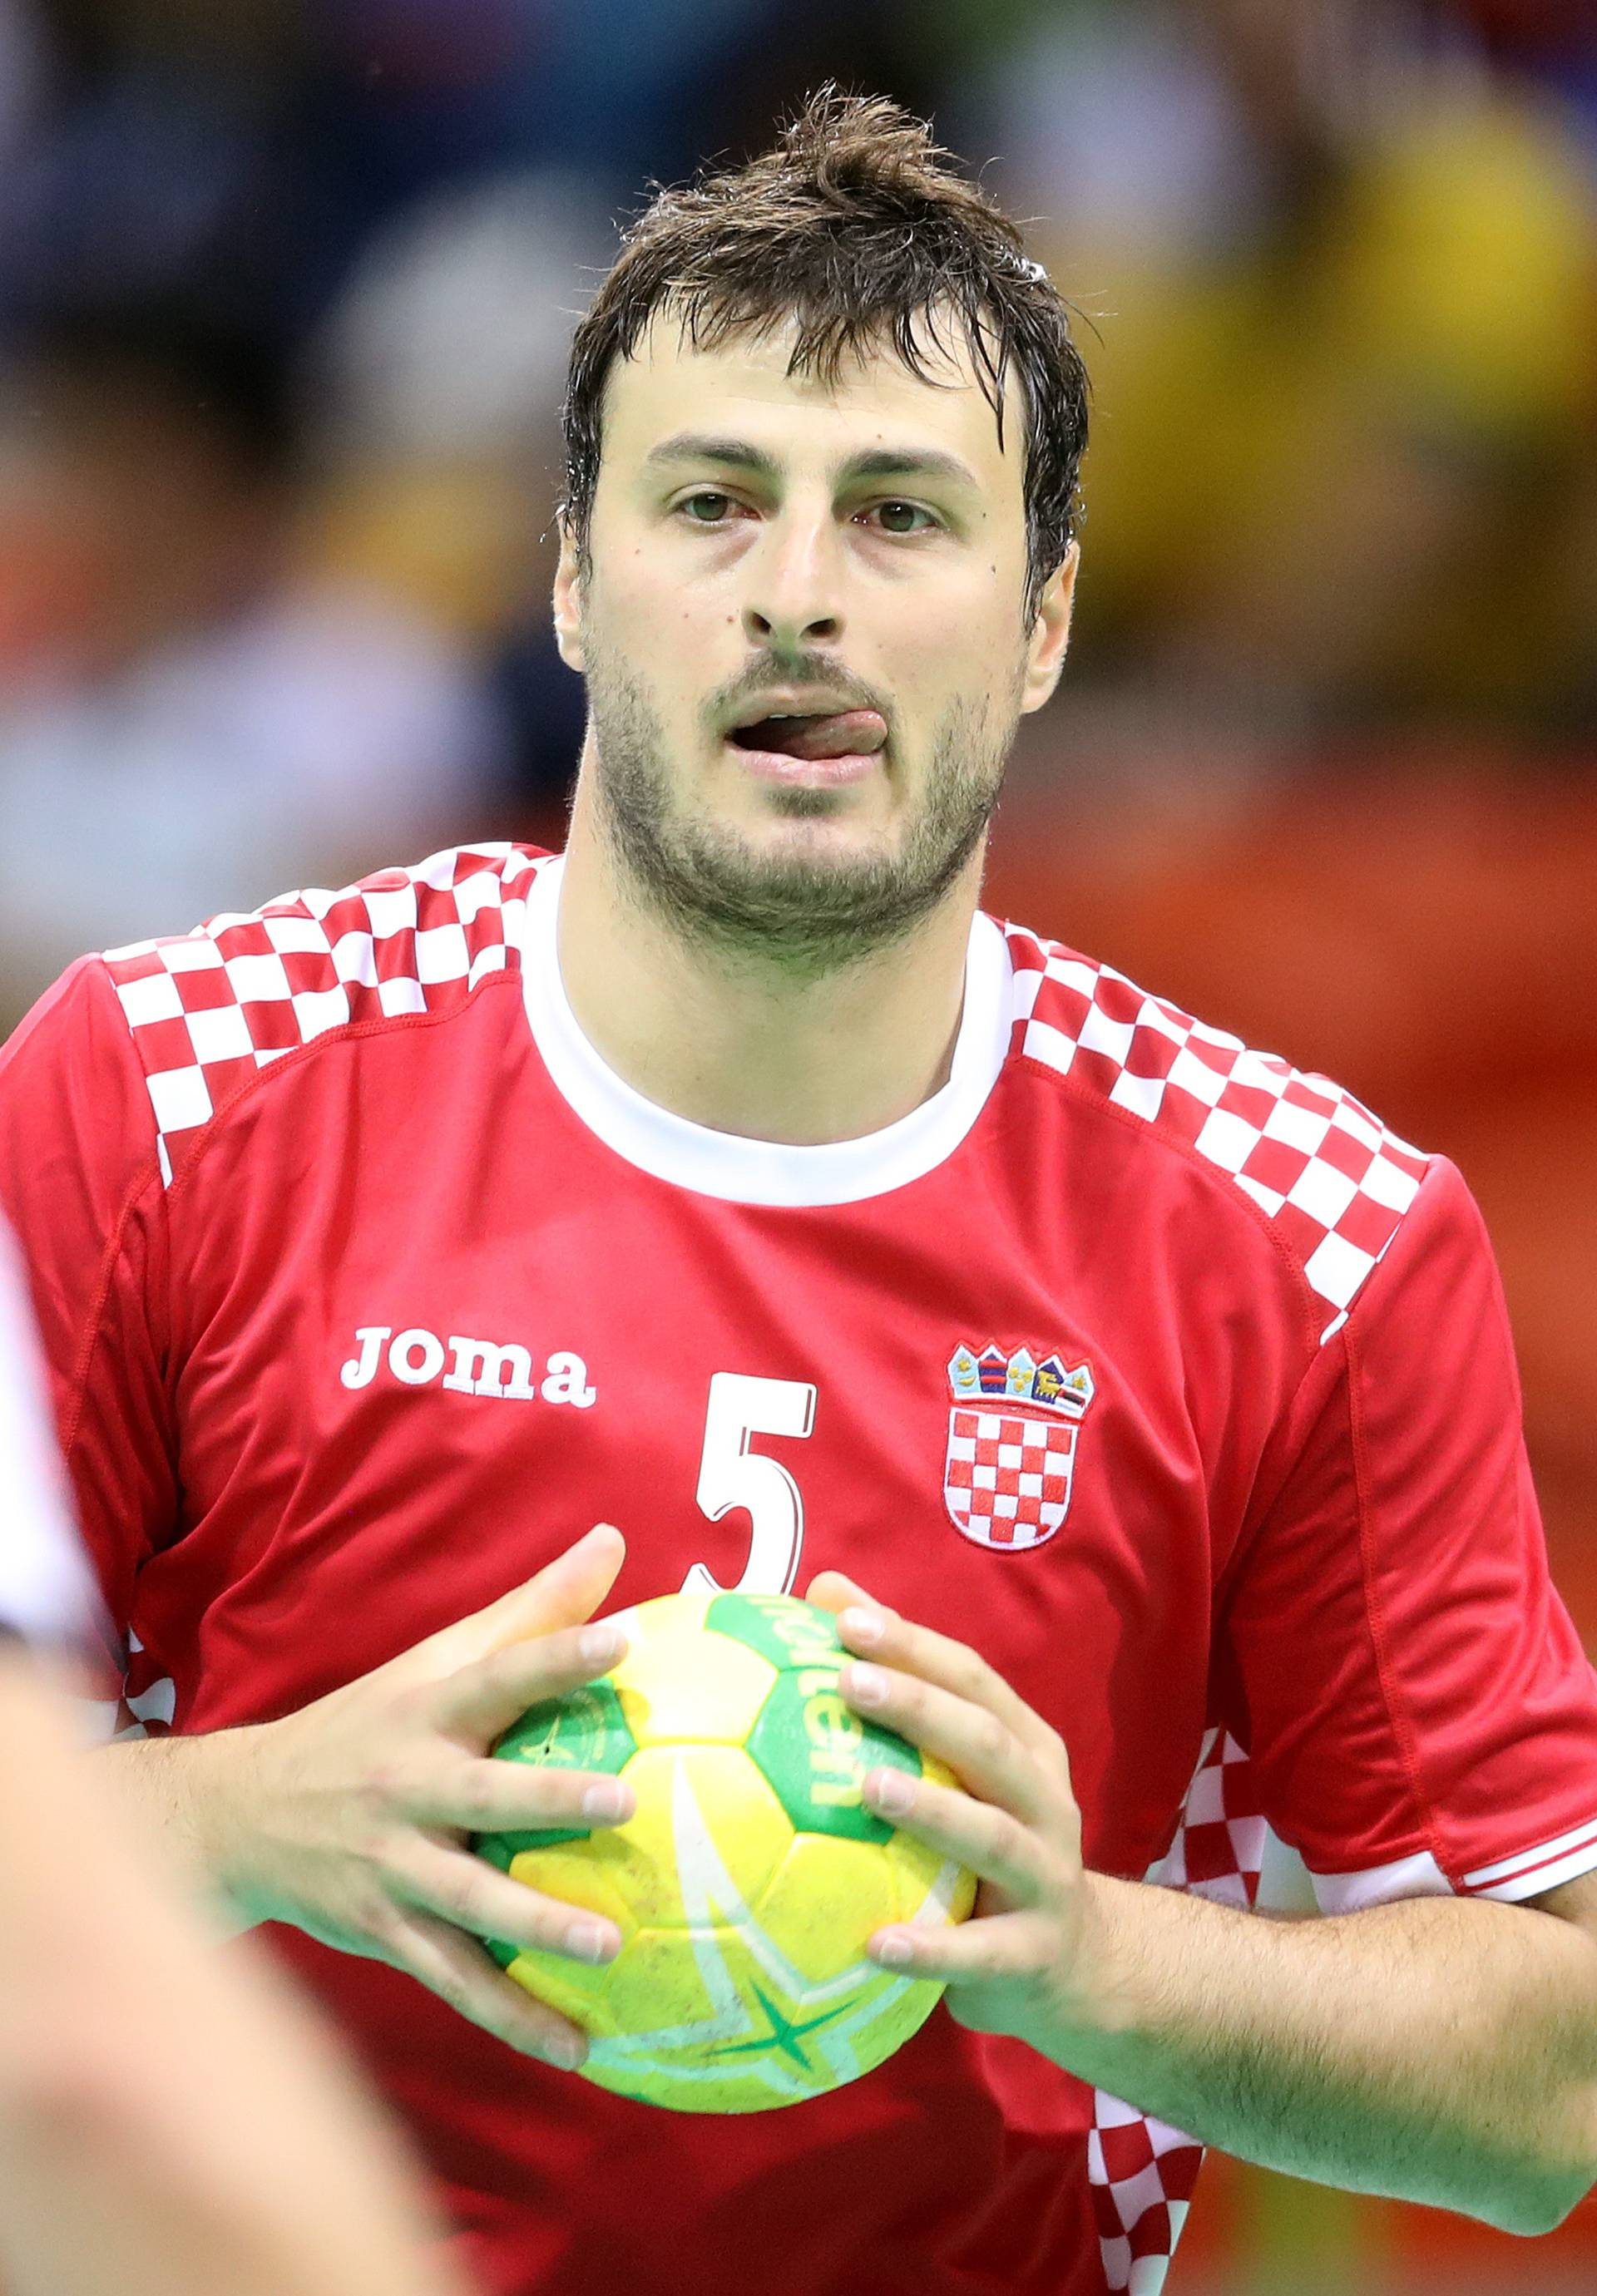 Lino skratio popis: Kapetan se vraća, otpali Marić, Pavlović...